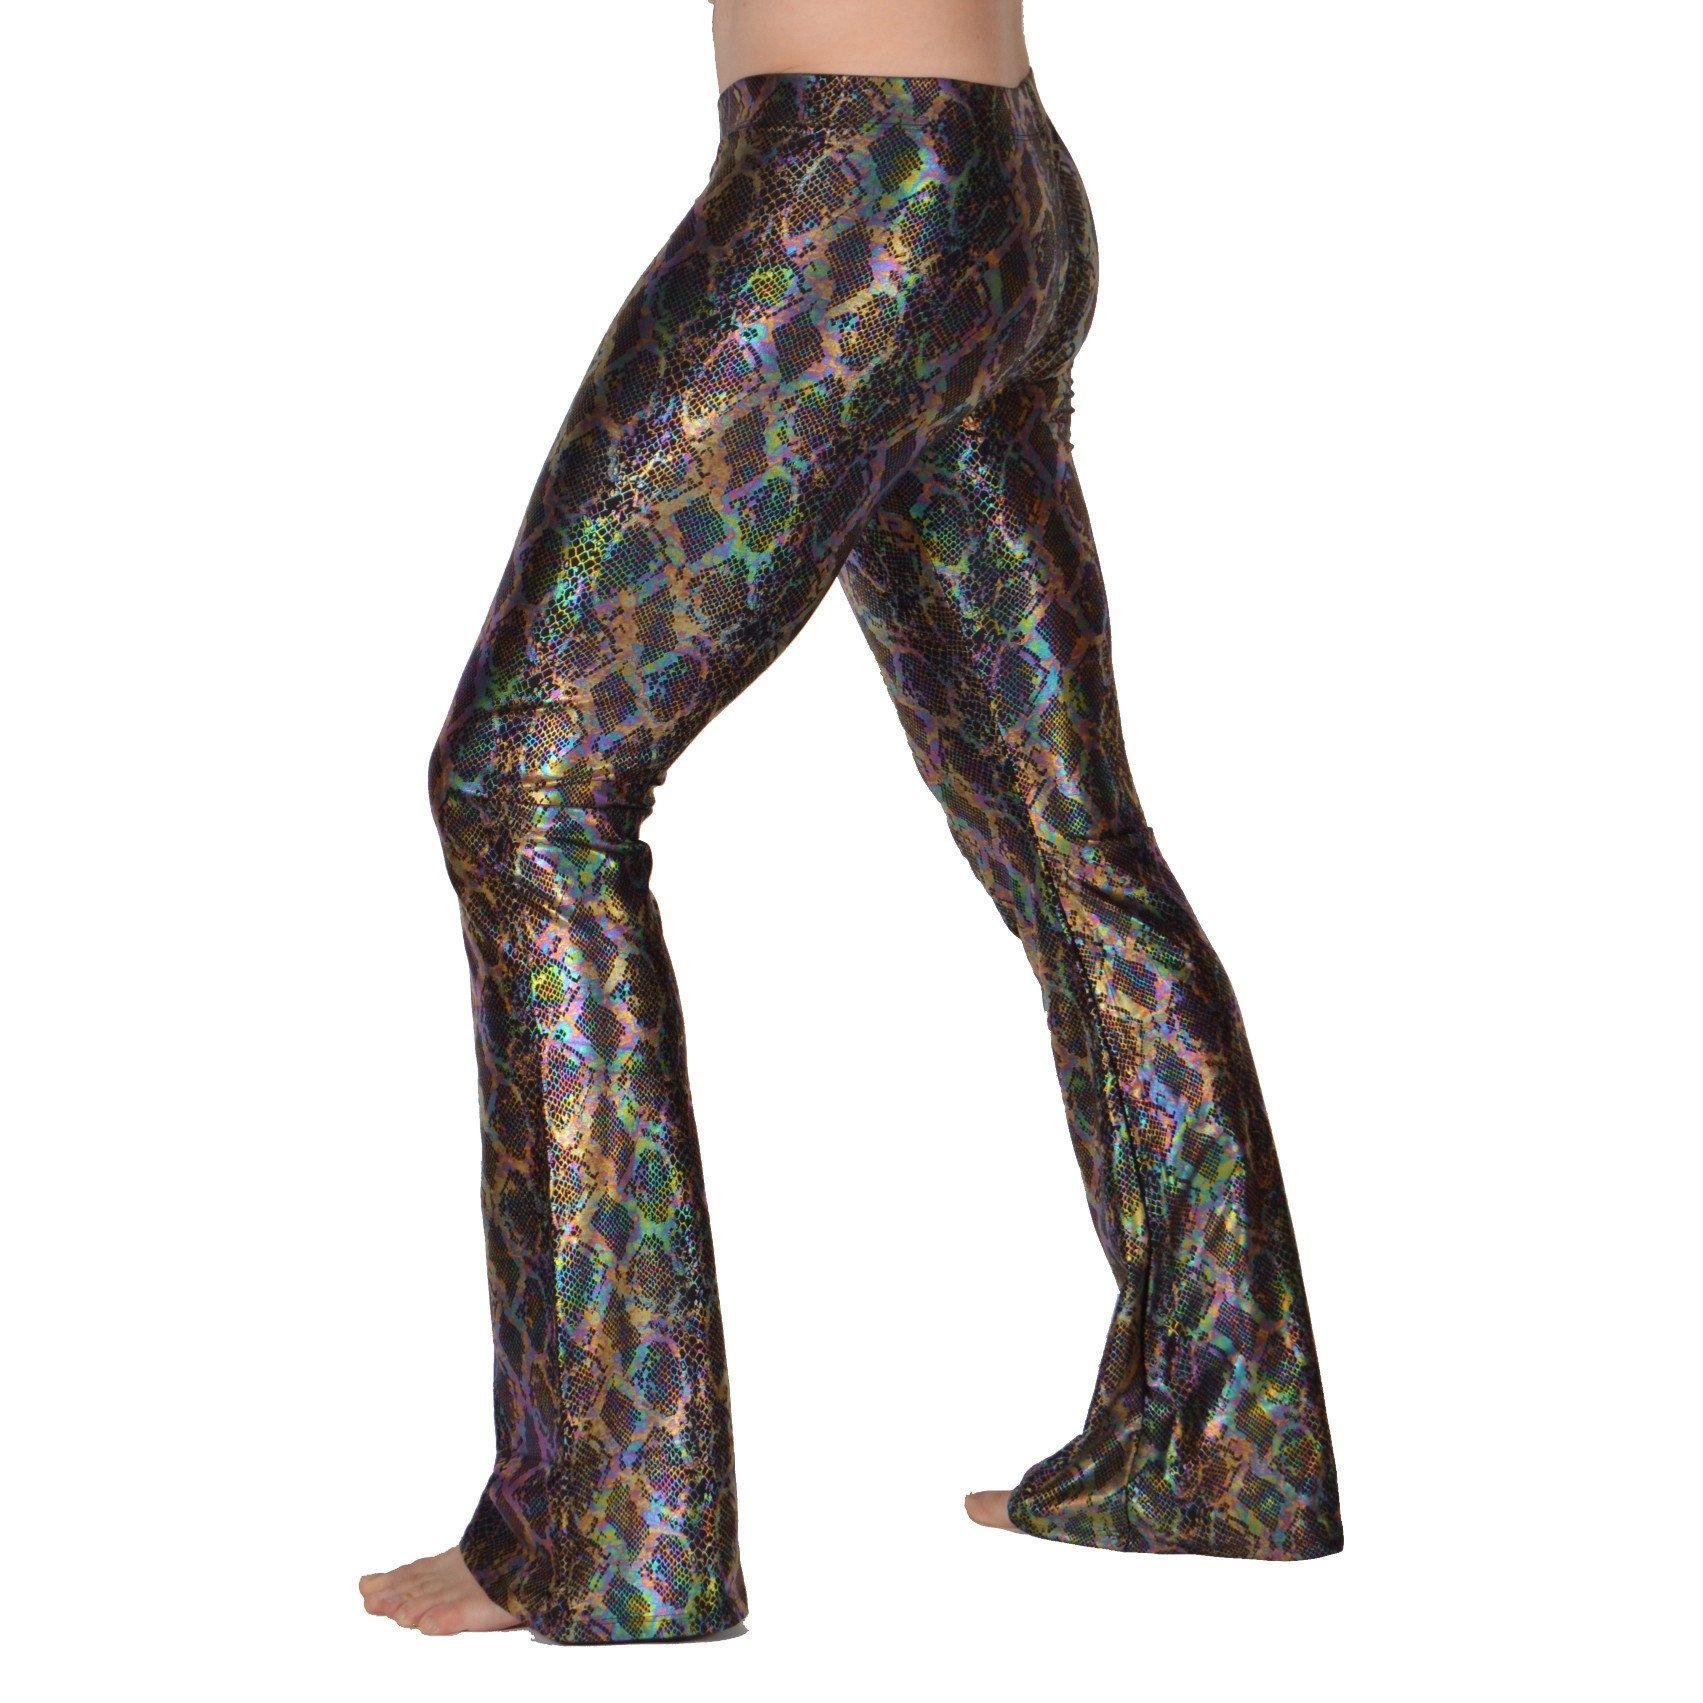 ebdf55baaf25c Snake Oil Holographic Men's Flare Pants. #holographic #meggings  #mensleggings #burningman #musicfestival #revolverfashion #flared  #festivalclothing ...